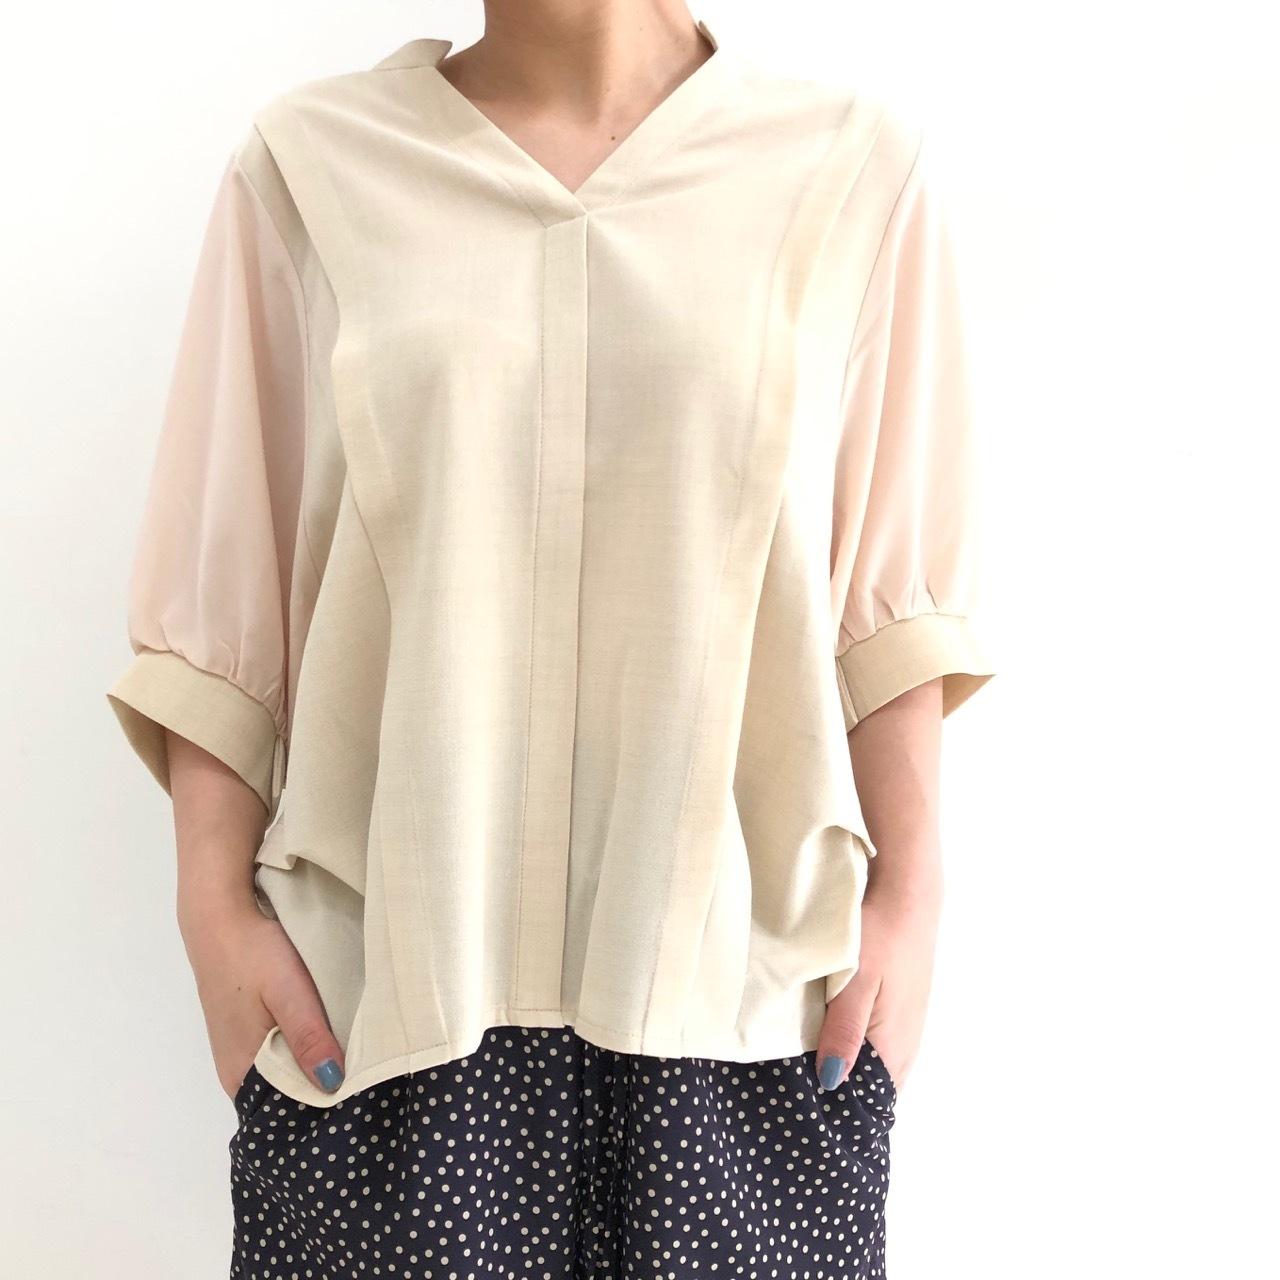 【 ROSIEE 】- 312701 - スキッパーシャツ